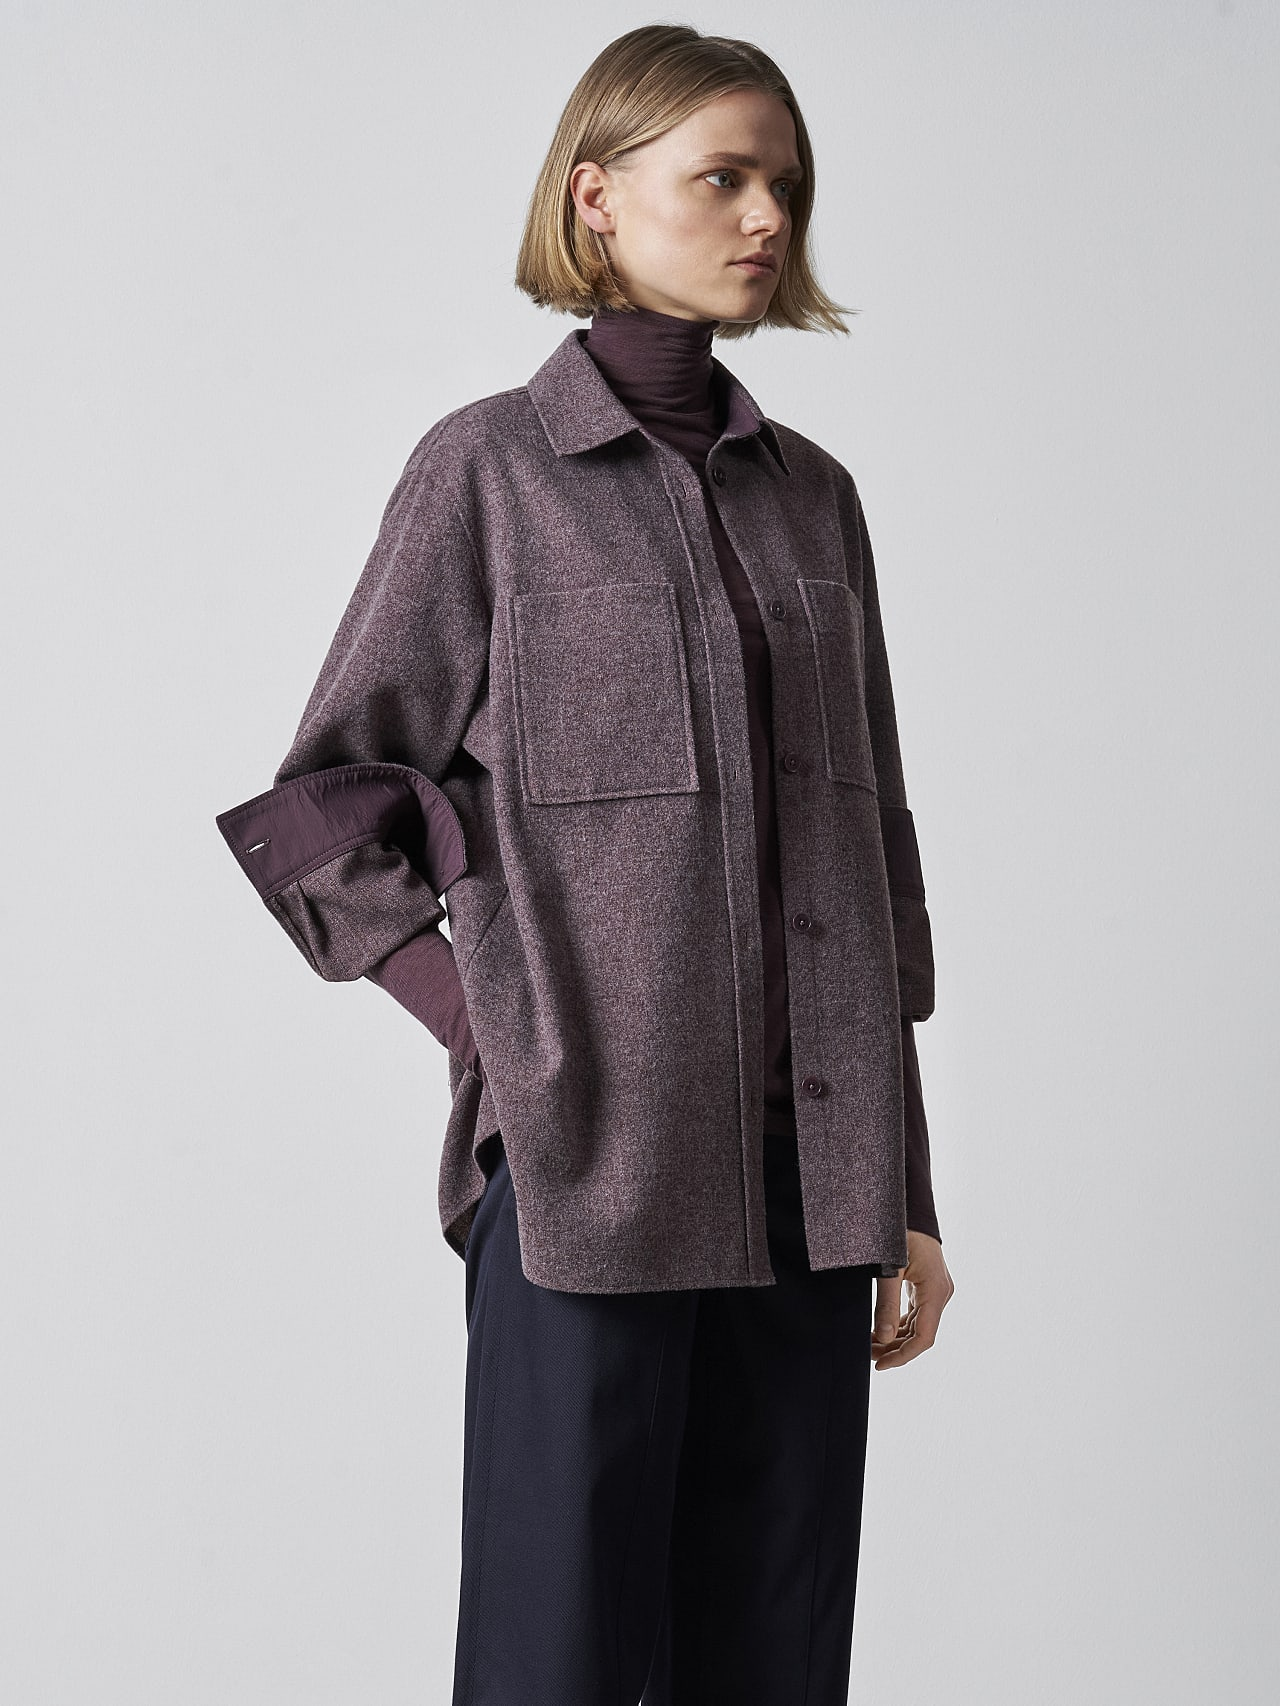 WOVIE V1.Y5.02 Wool Over-Shirt Burgundy Model shot Alpha Tauri